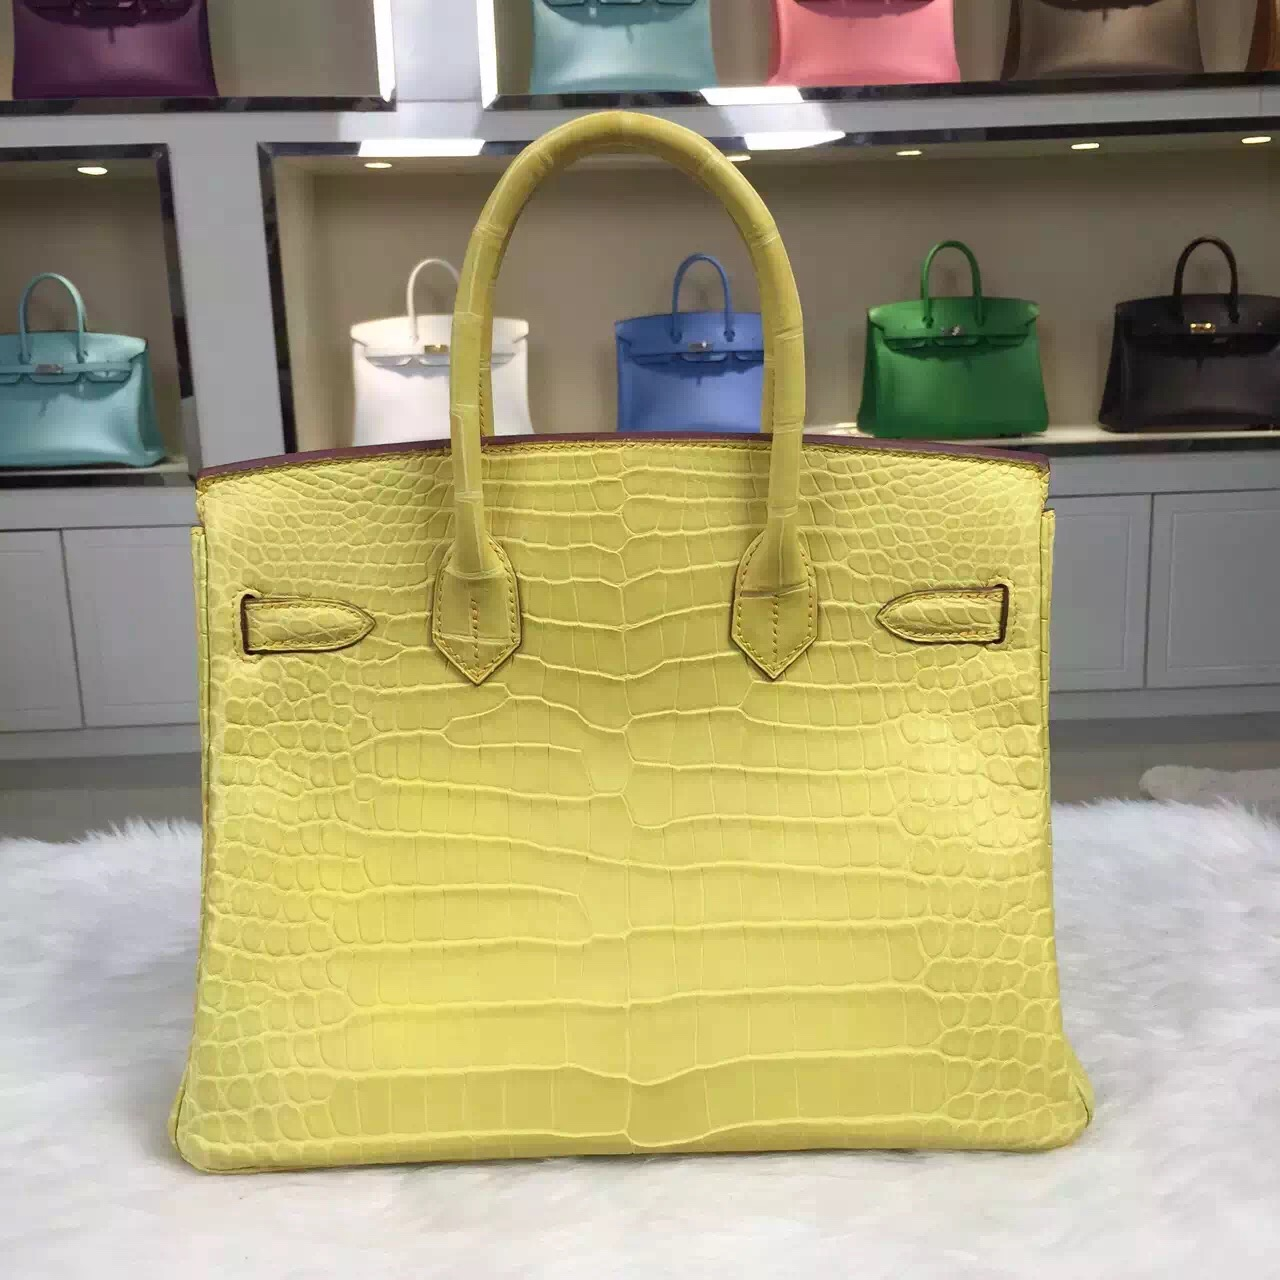 Hand Stitching Hermes M9 Mimosa Original Crocodile Leather Birkin 30cm Women's Bag